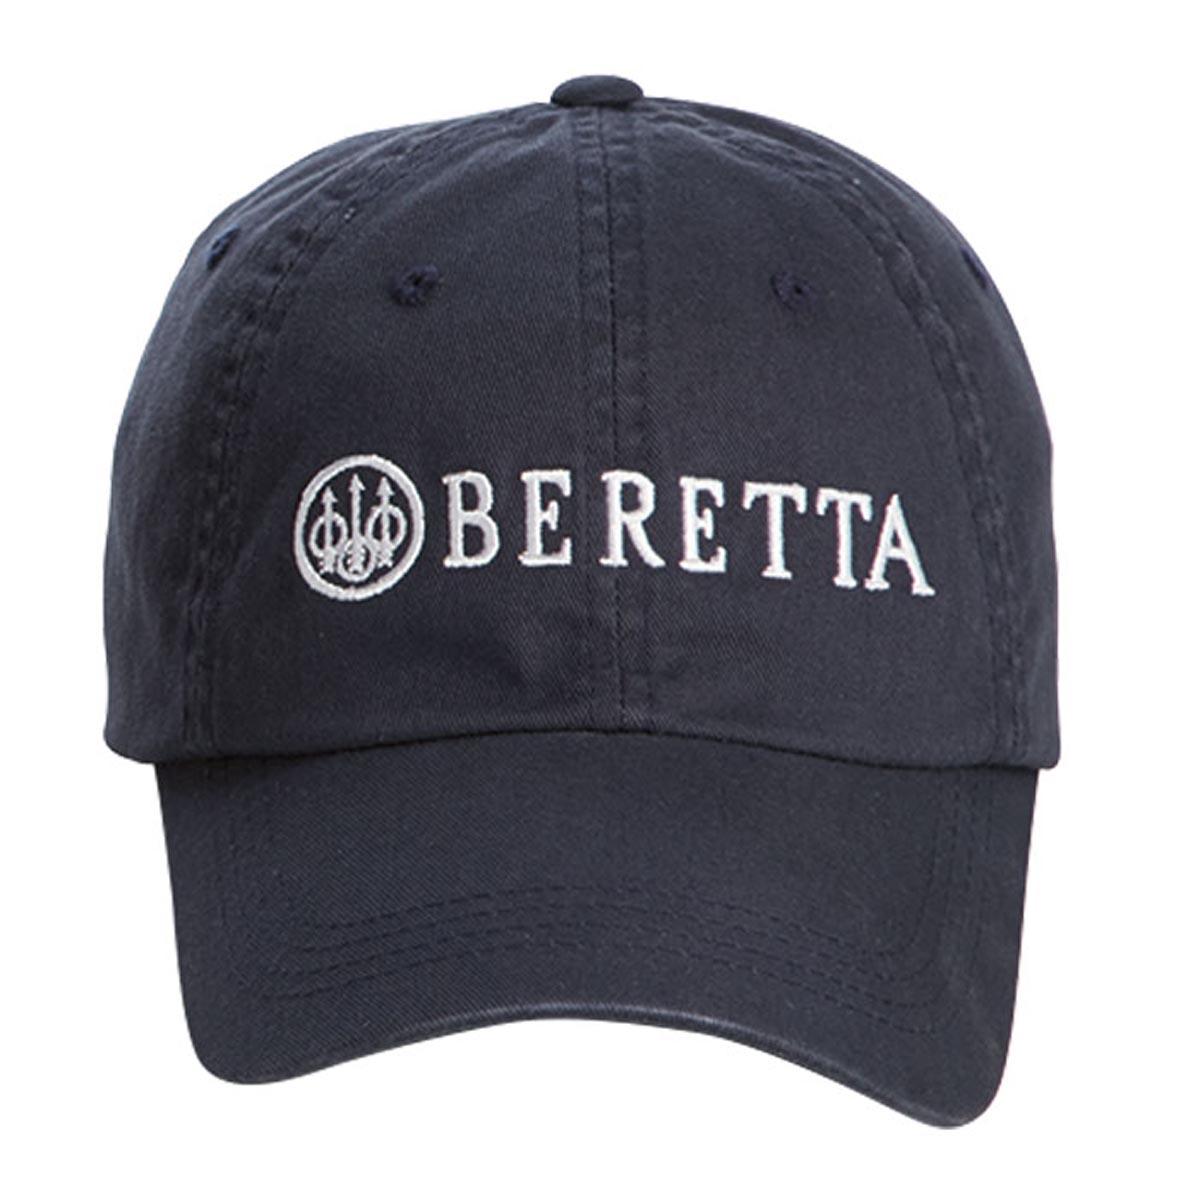 e7568642ed1 Beretta Cotton Twill Cap-Navy